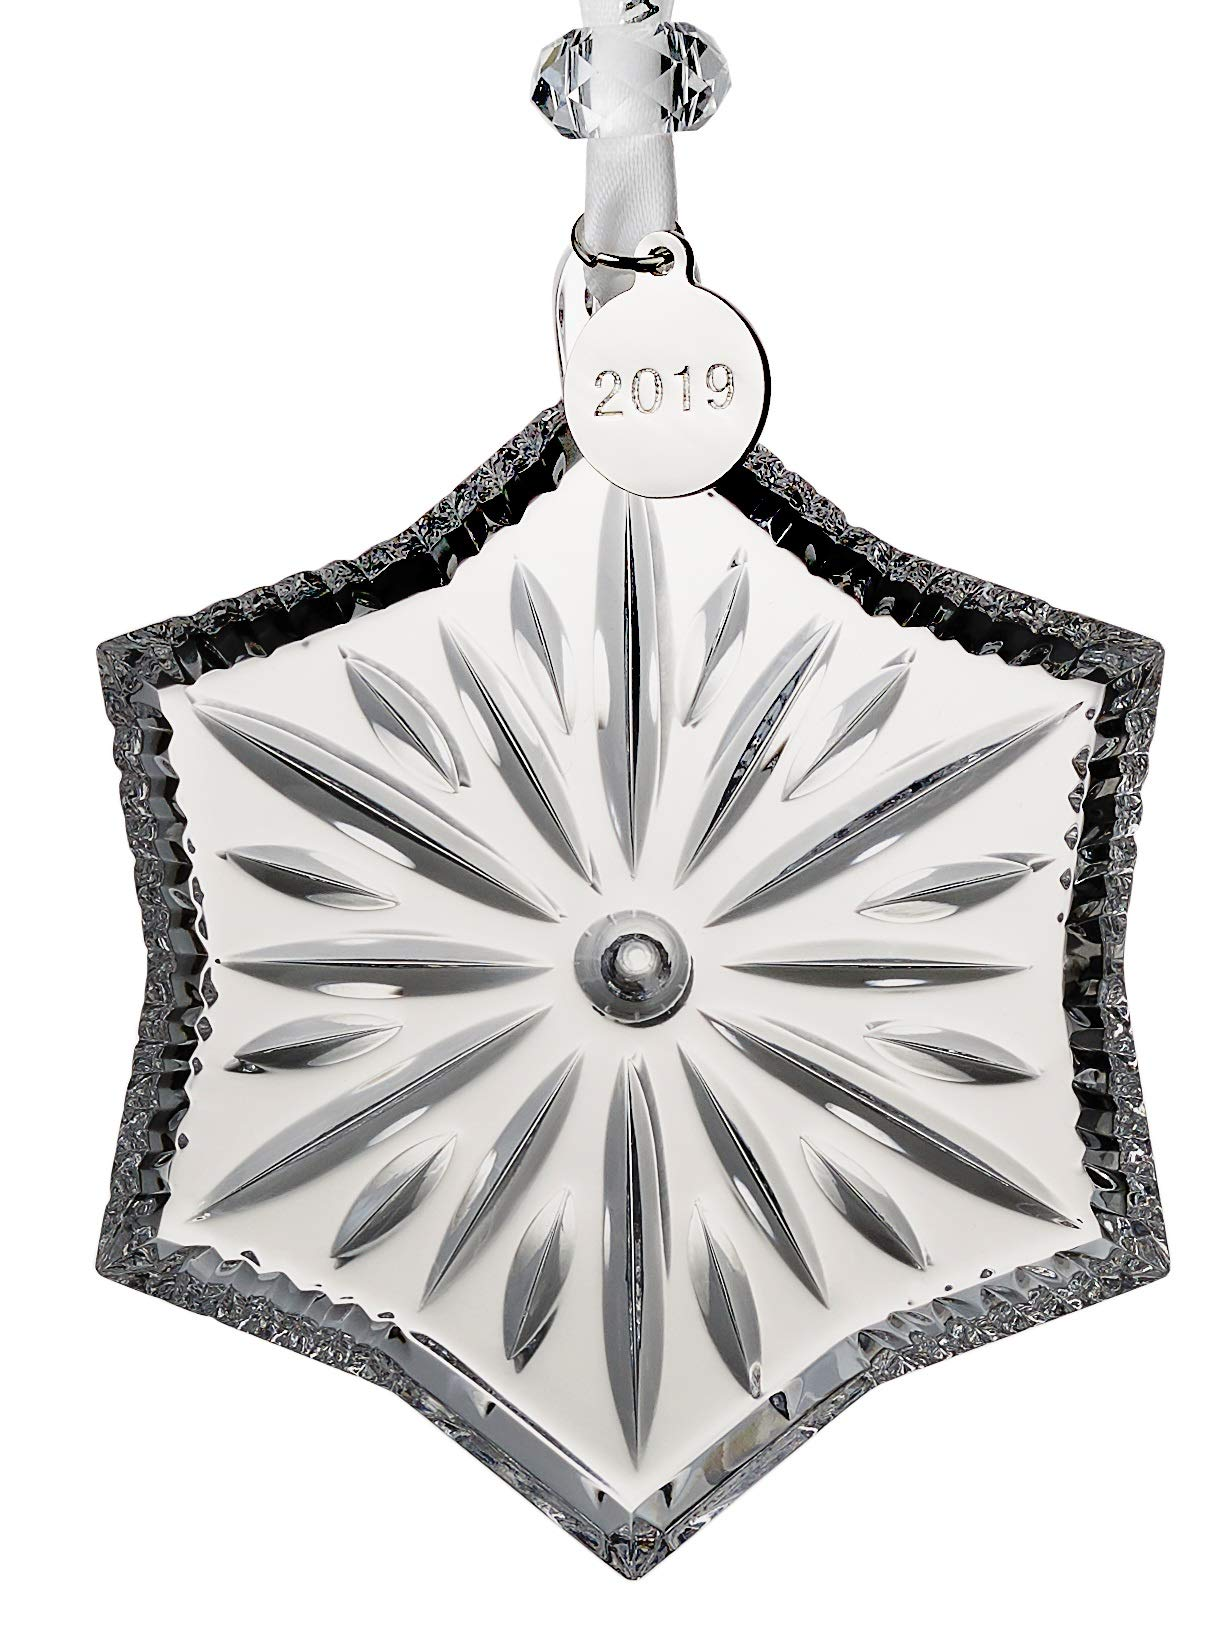 Waterford Crystal Snowcrystal Ornament 3.7''